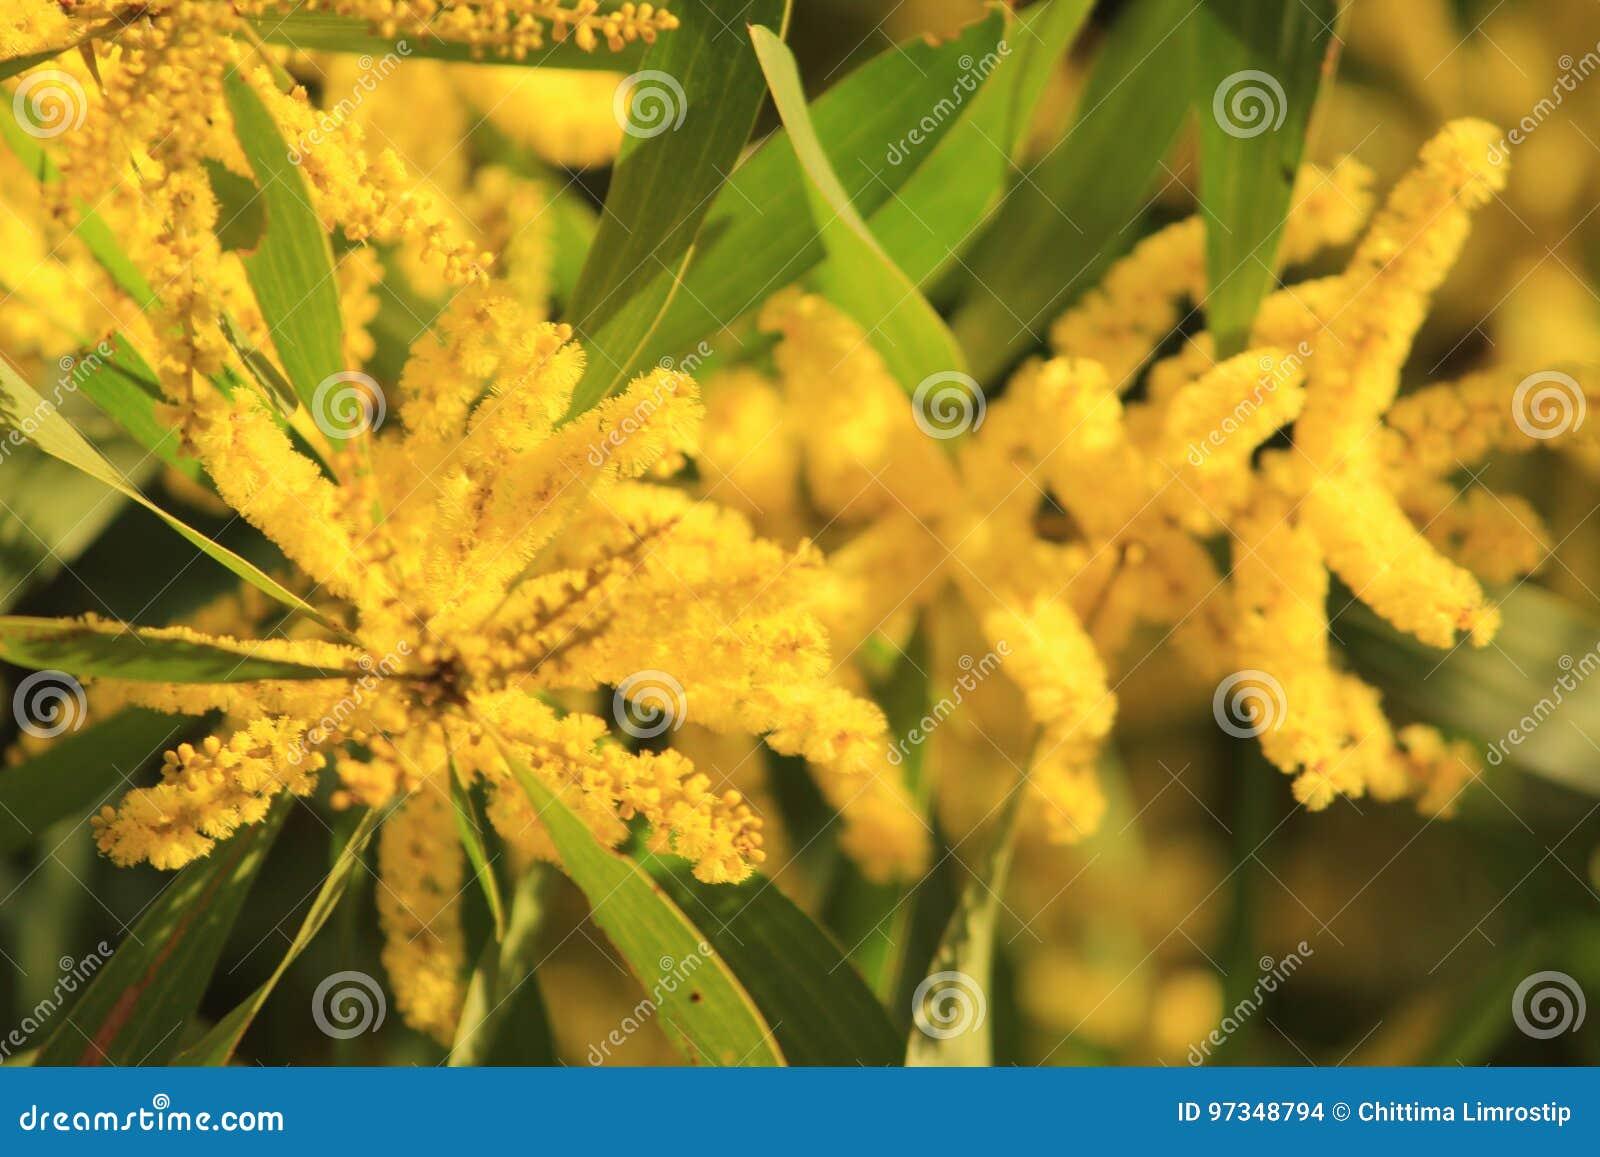 Australian yellow flowers stock photo image of flowers 97348794 download australian yellow flowers stock photo image of flowers 97348794 mightylinksfo